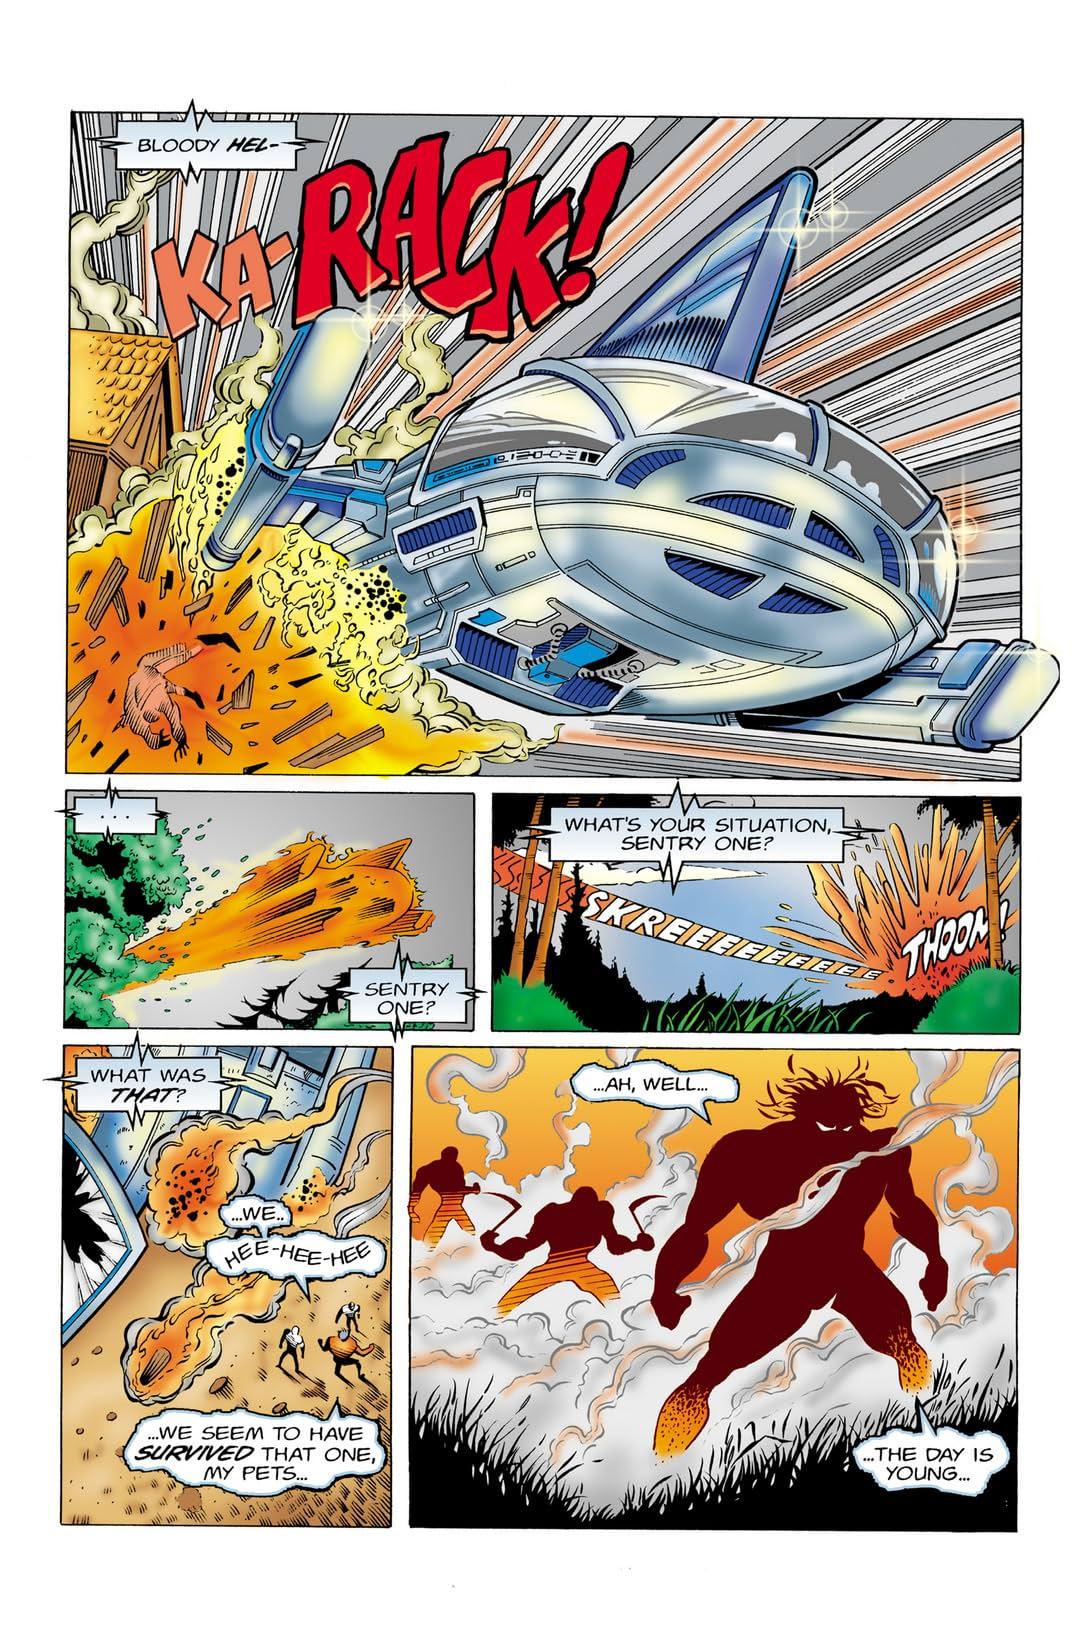 StormQuest #1